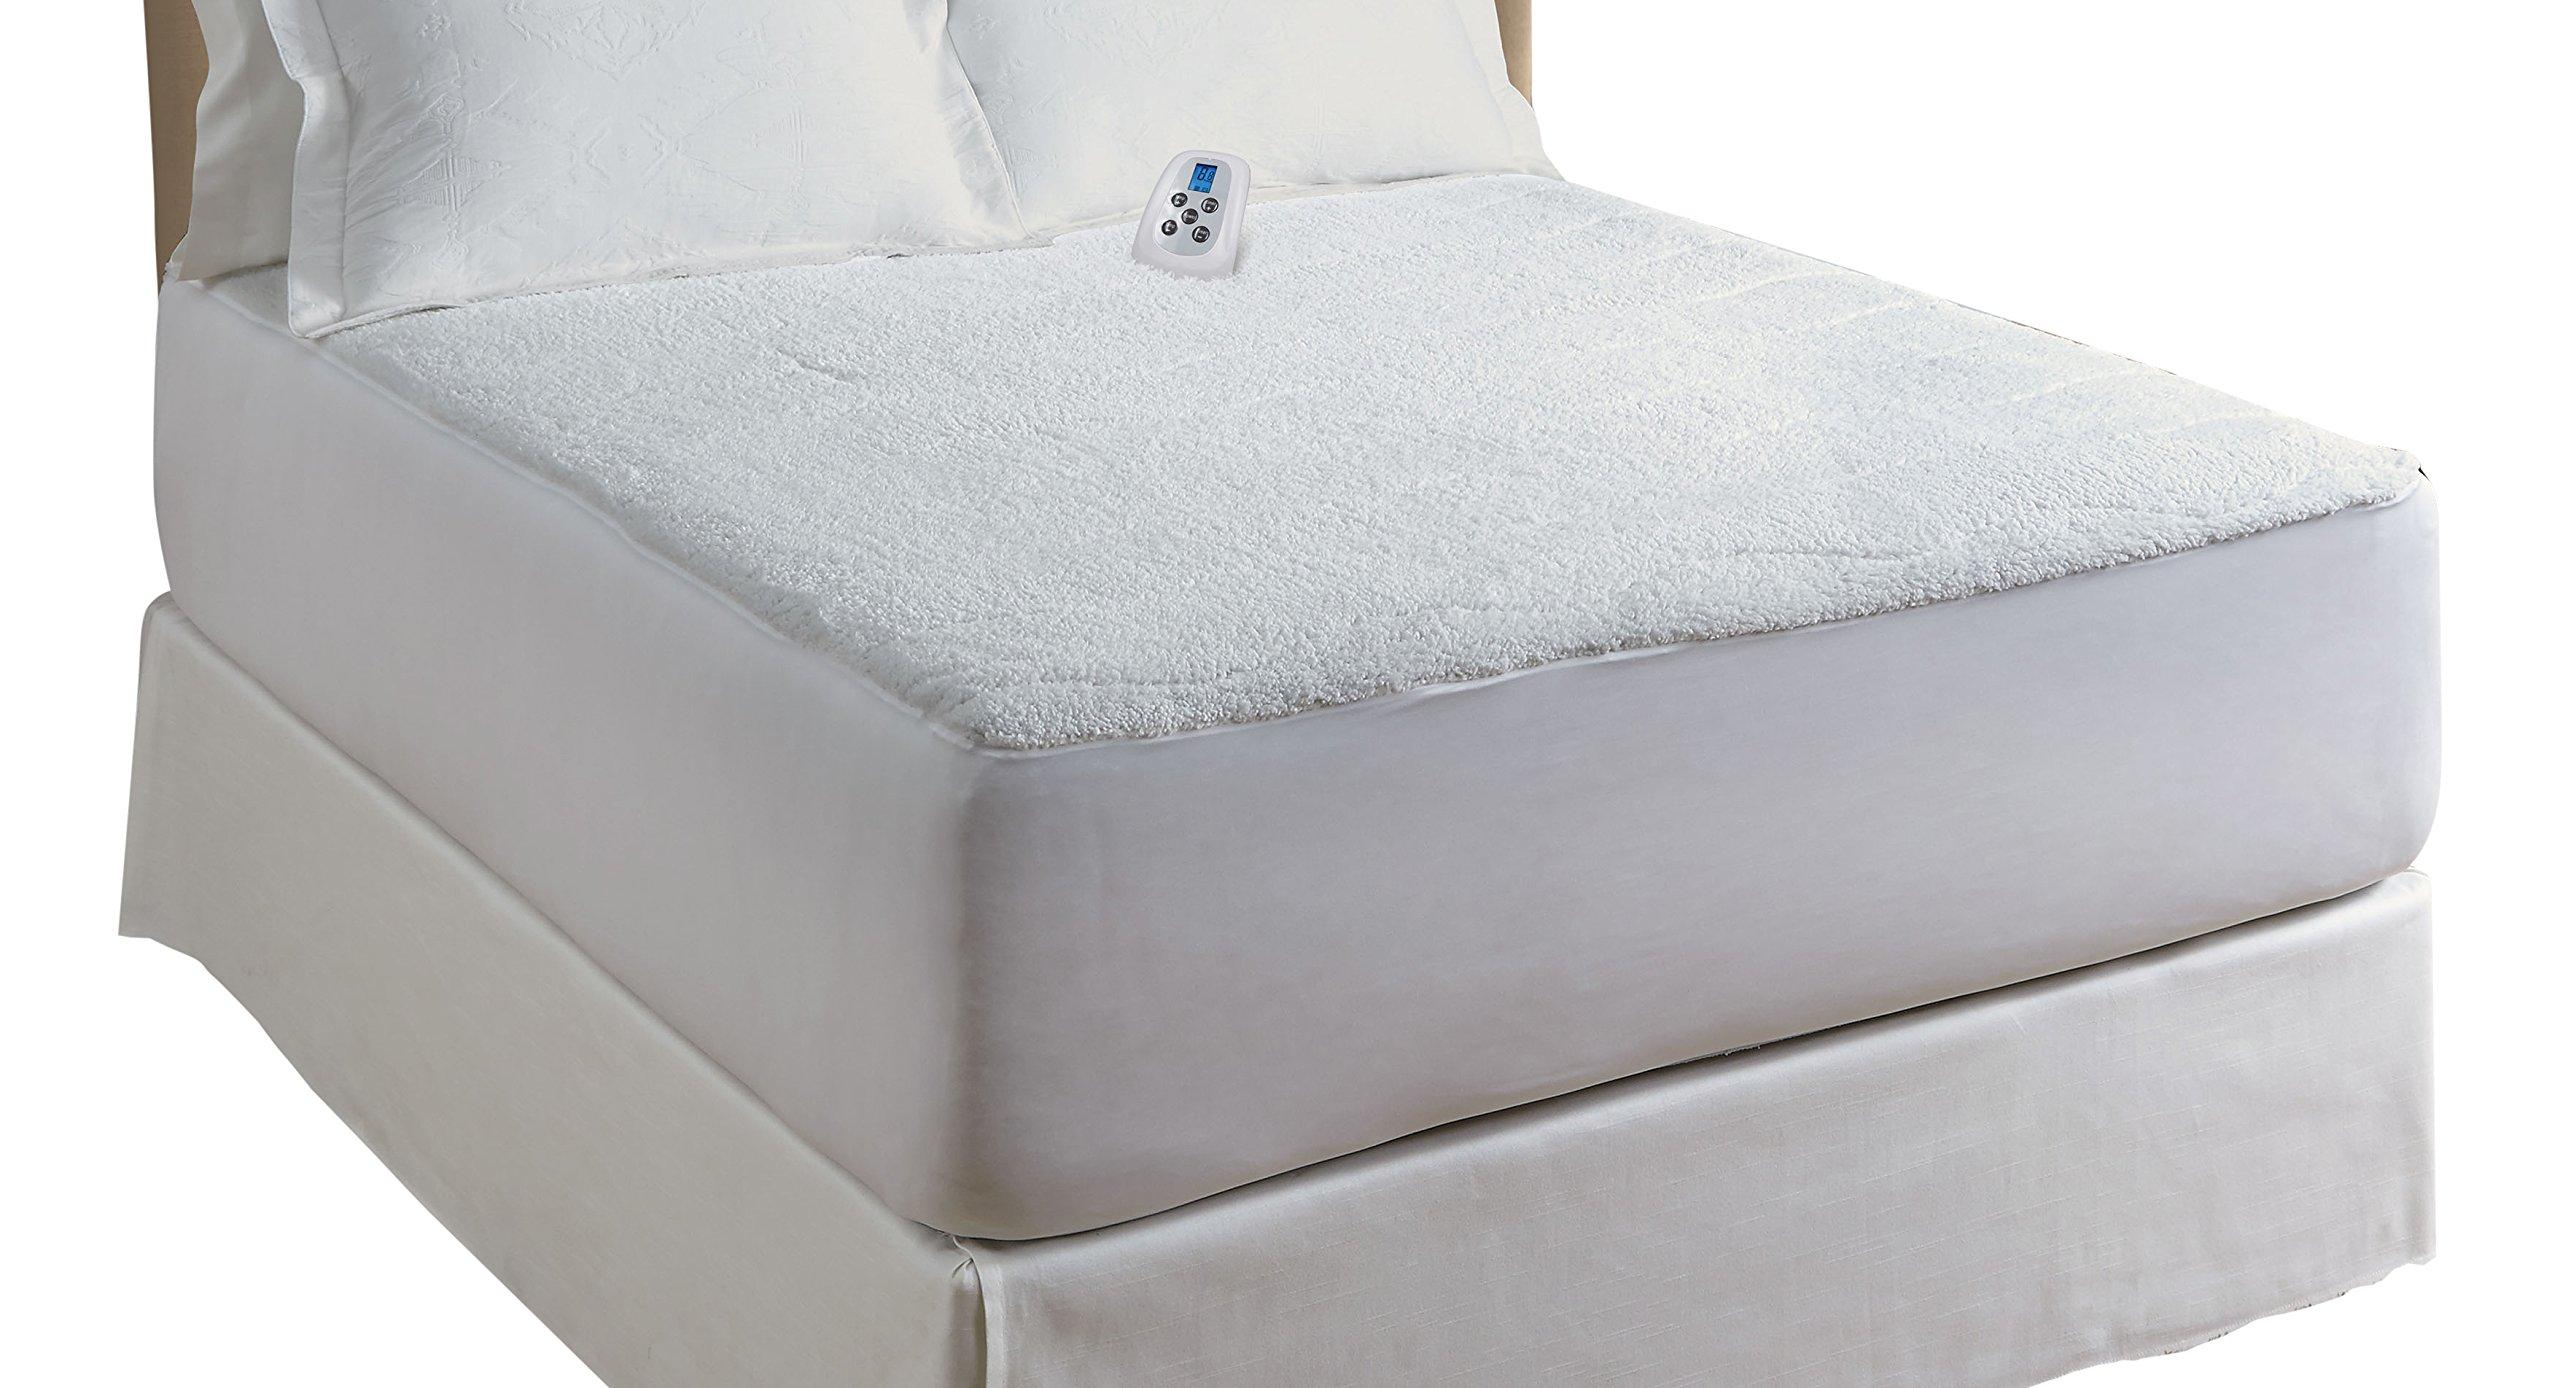 Serta Sherpa Plush Electric Heated Mattress Pad with Programmable Digital Controller, Full Size, White